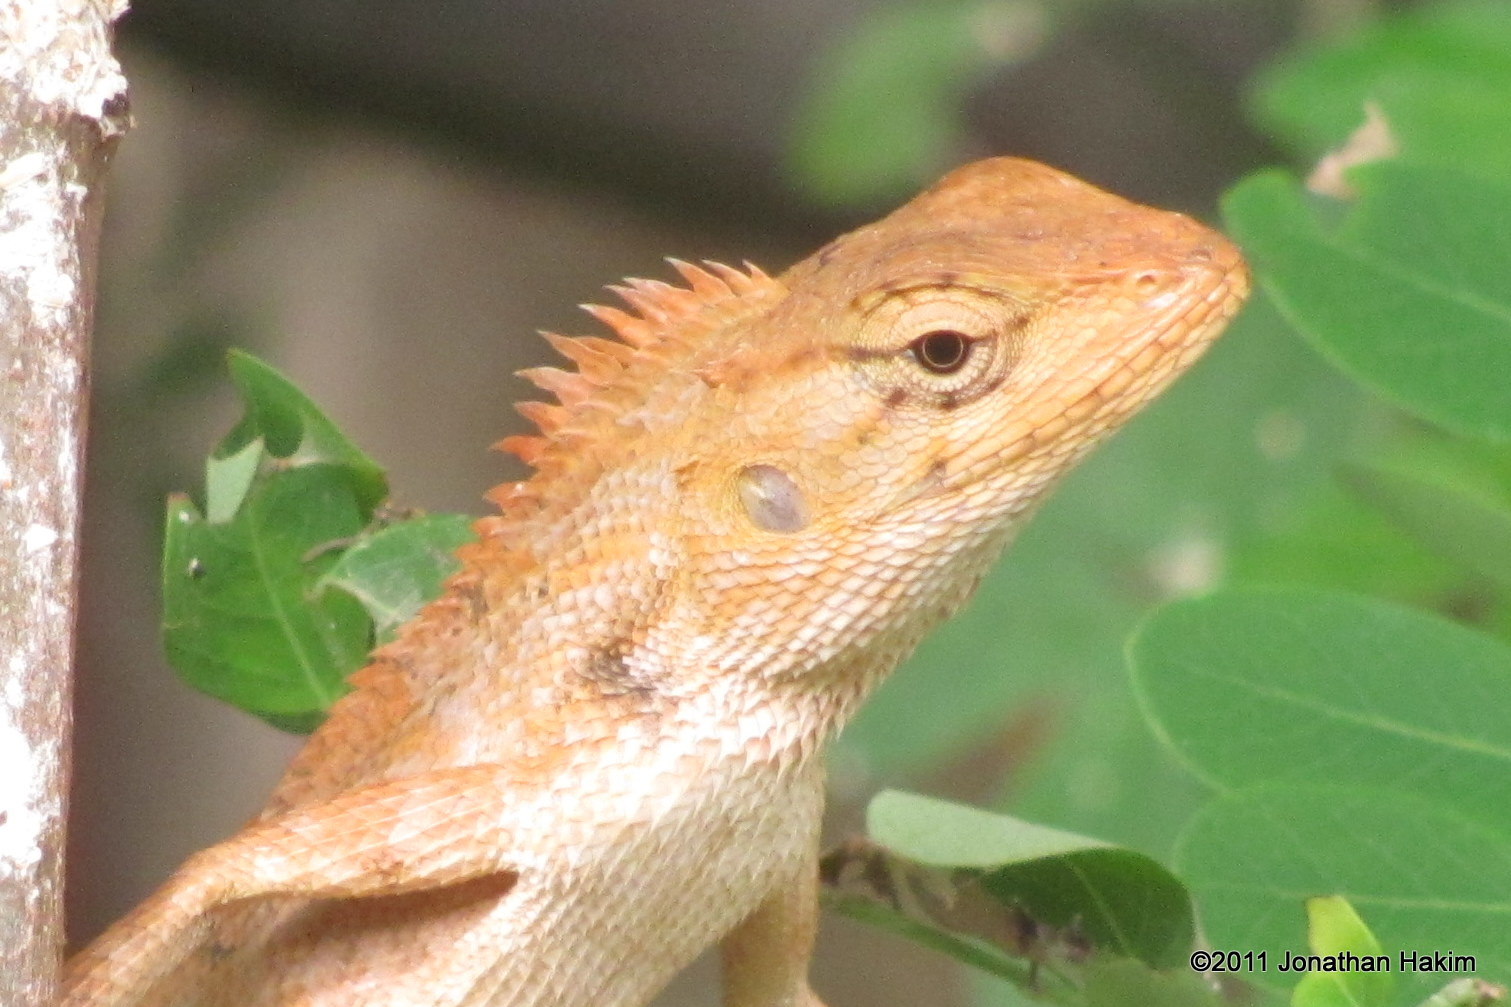 changeable lizard calotes versicolor head shot - Garden Lizard